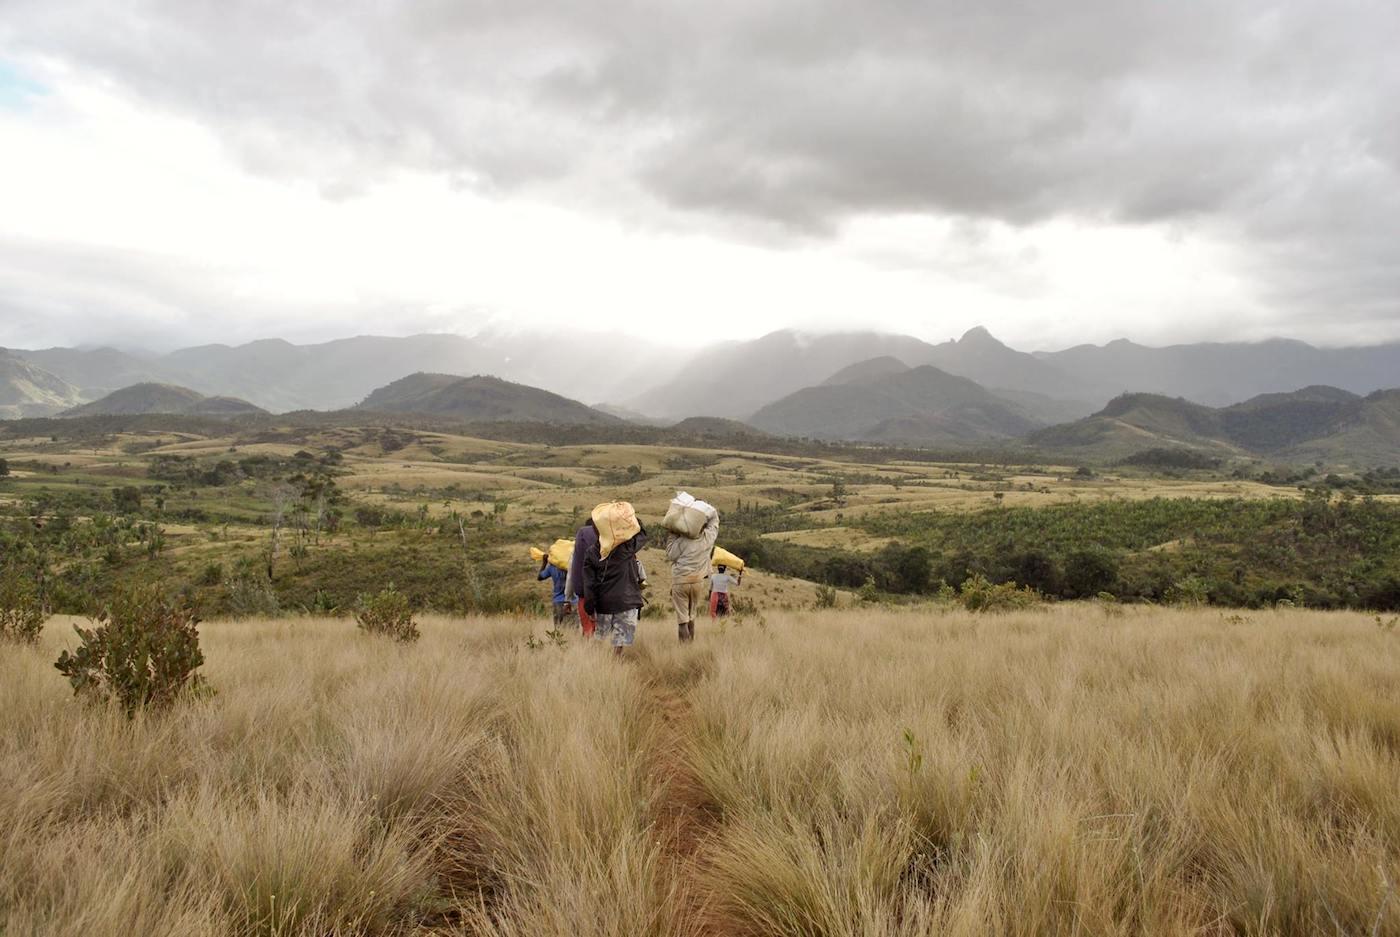 Paesaggio malgascio vicino ad Ampasy - foto Rachel Sawyer